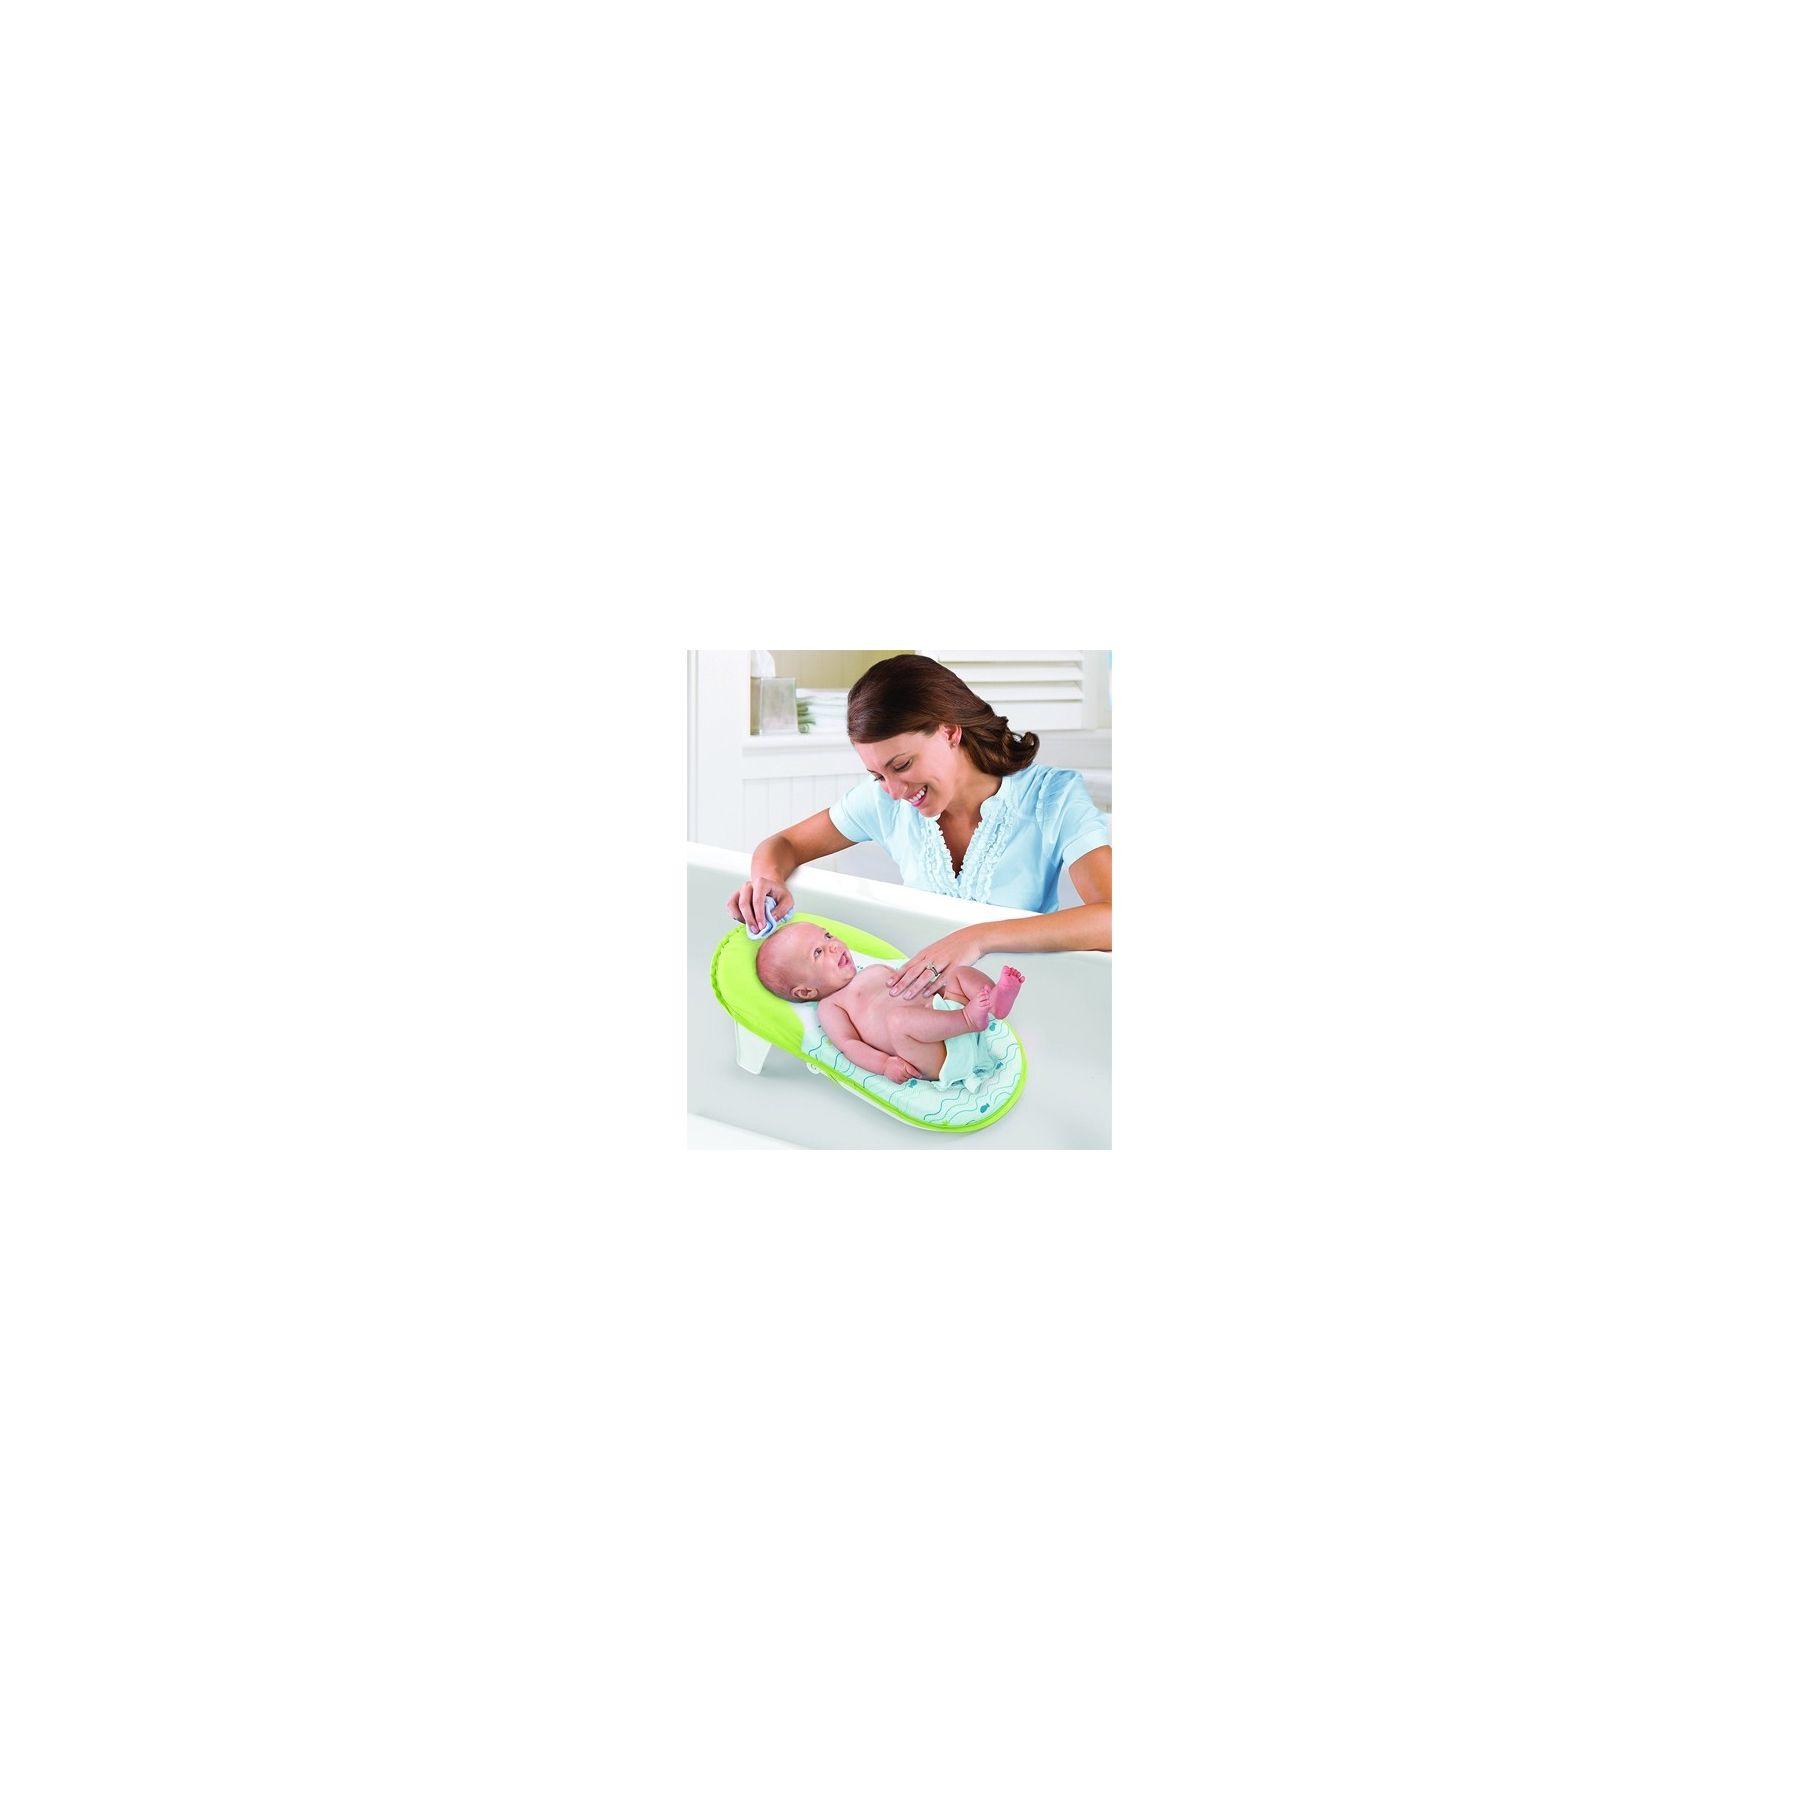 Transat de bain pliable Poissons Summer Infant